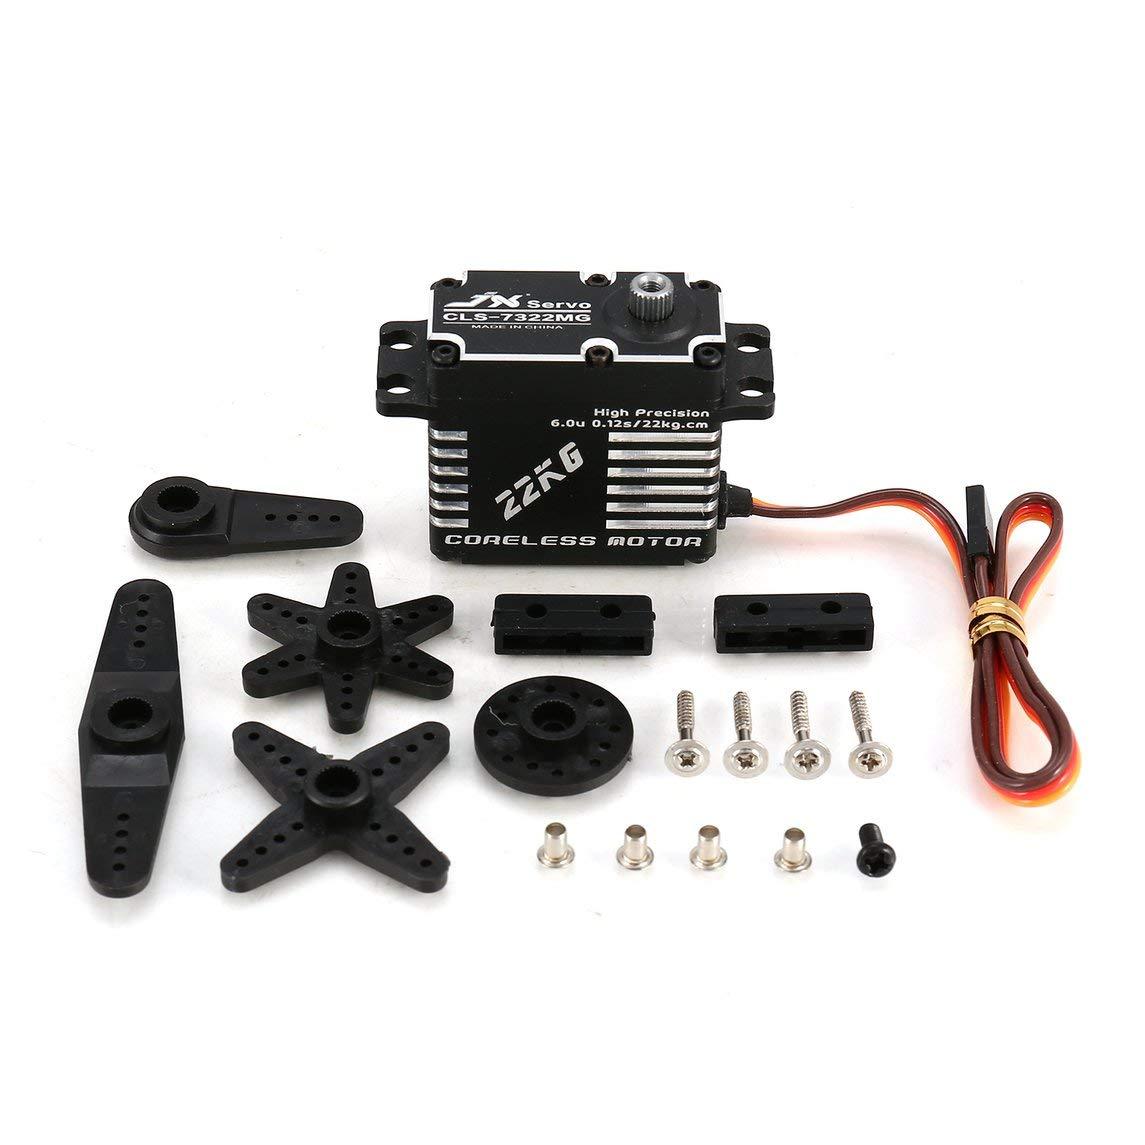 Jasnyfall JX CLS-7322MG 22 KG Metalllenkung Digital Gear Coreless Servo für RC Car Schwarz